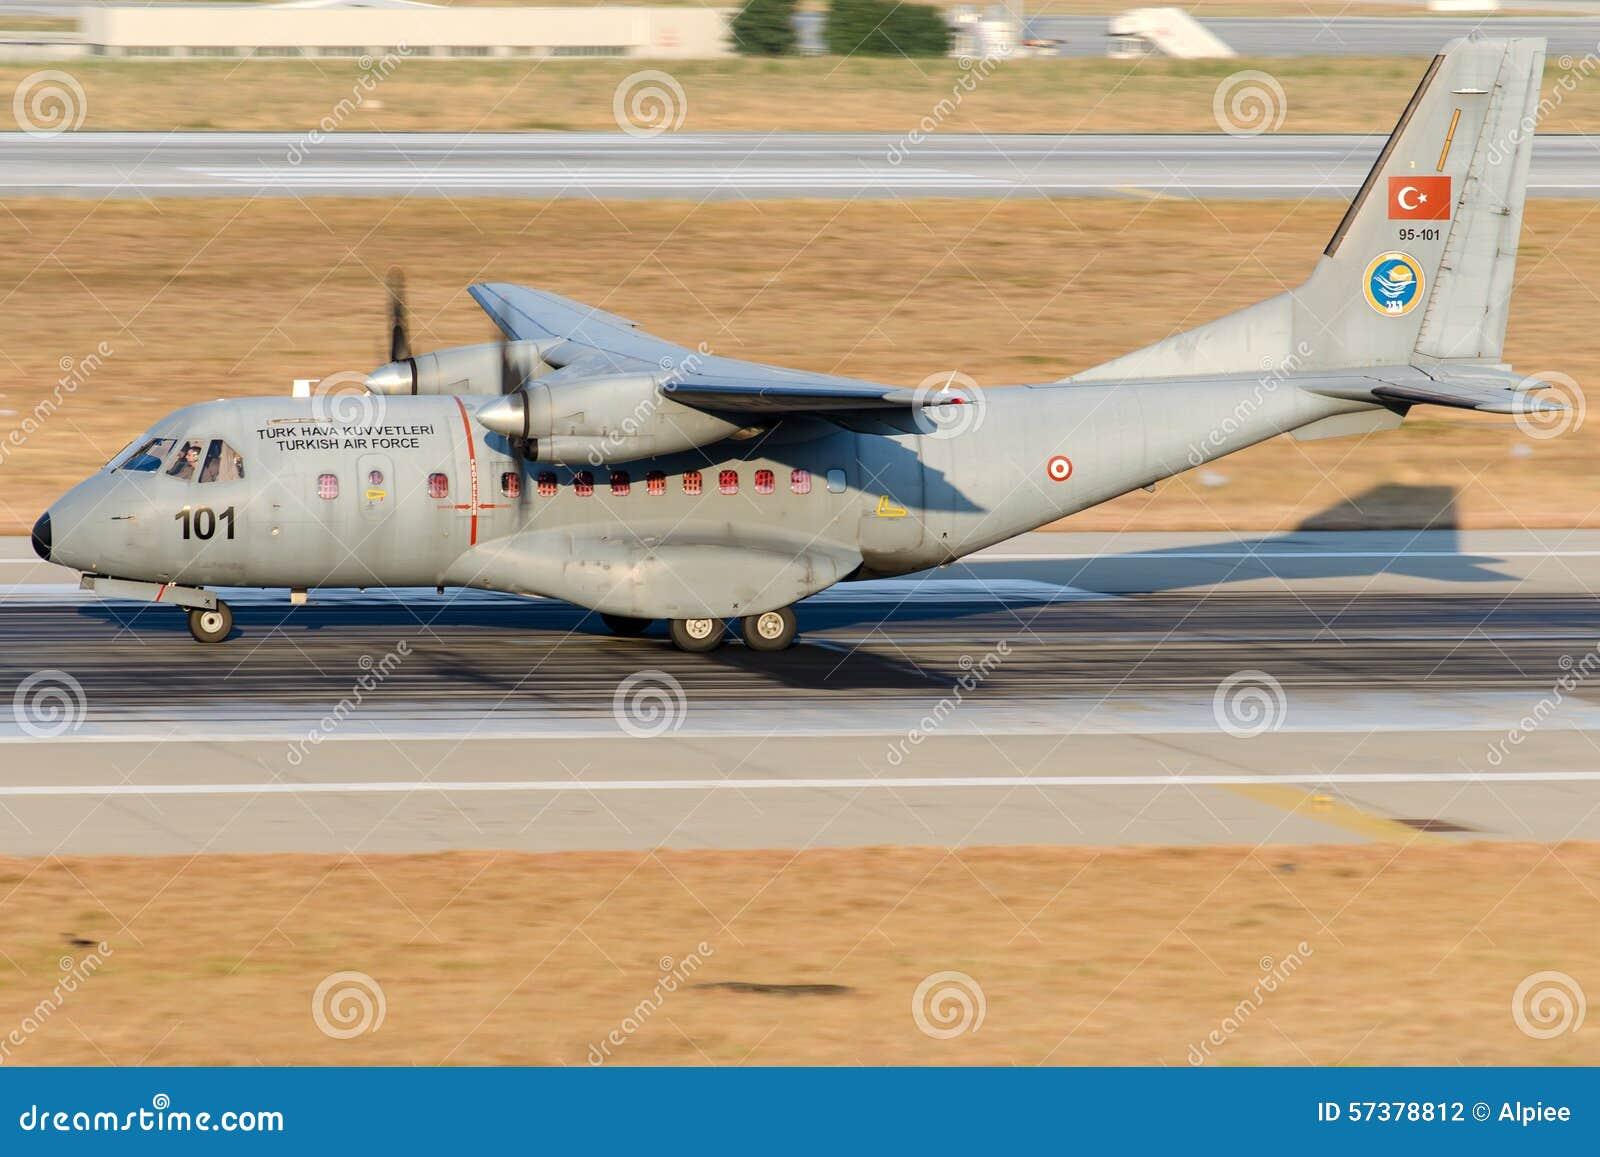 95-101 Turkse Luchtmacht, CASA cn-235m-100